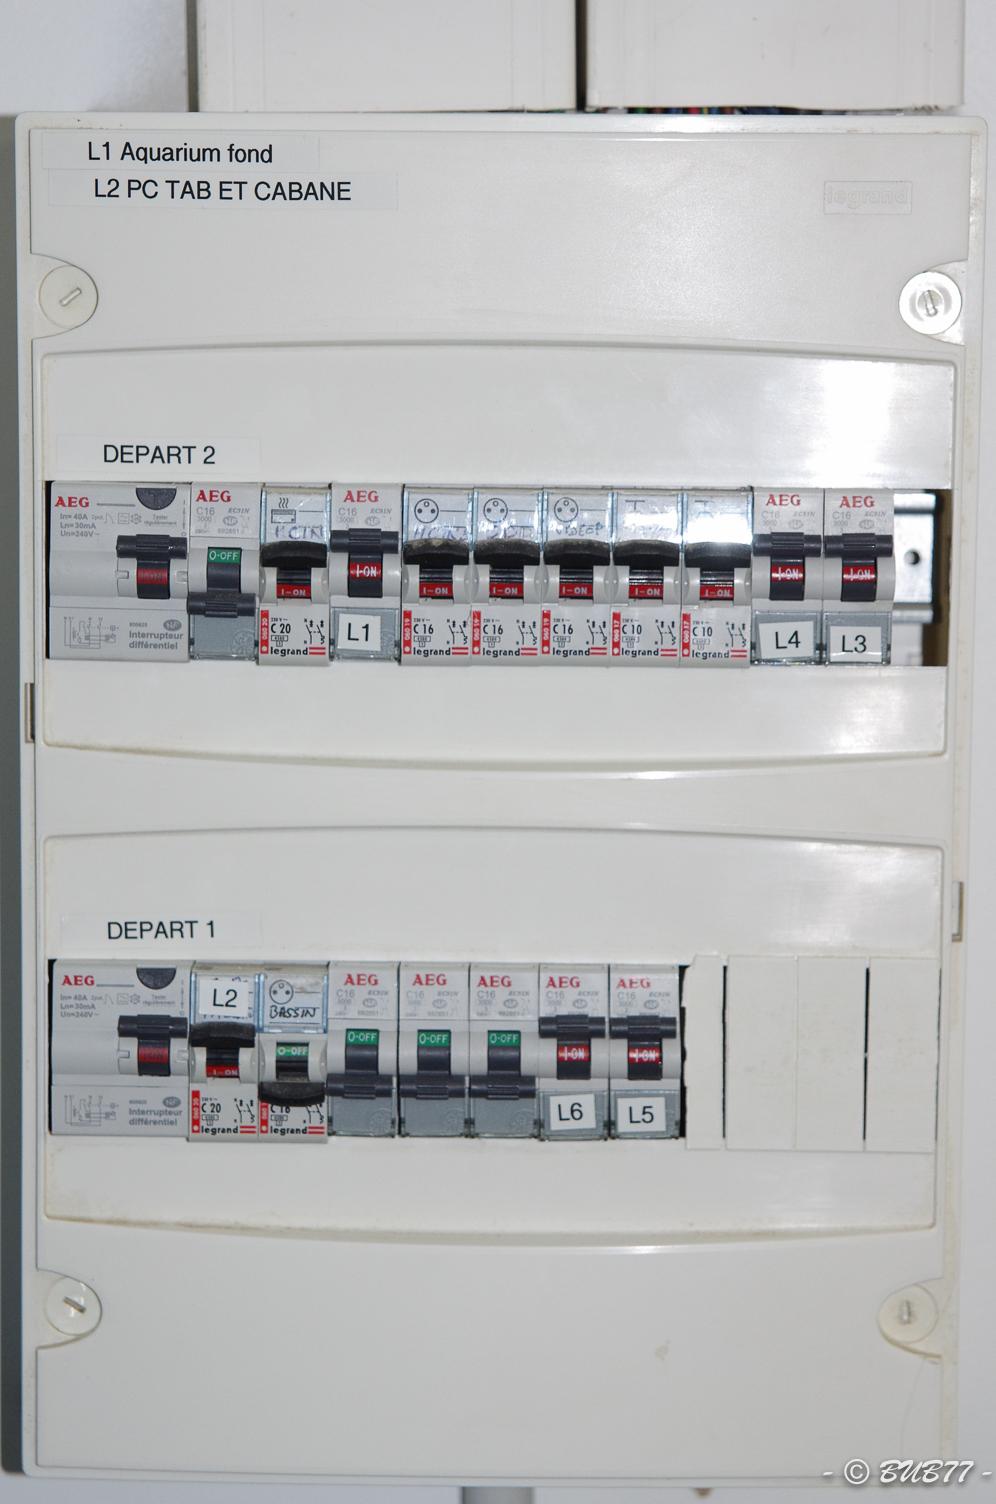 Projet de bac mixte Jaubert - DSB - Page 2 Imgp90618